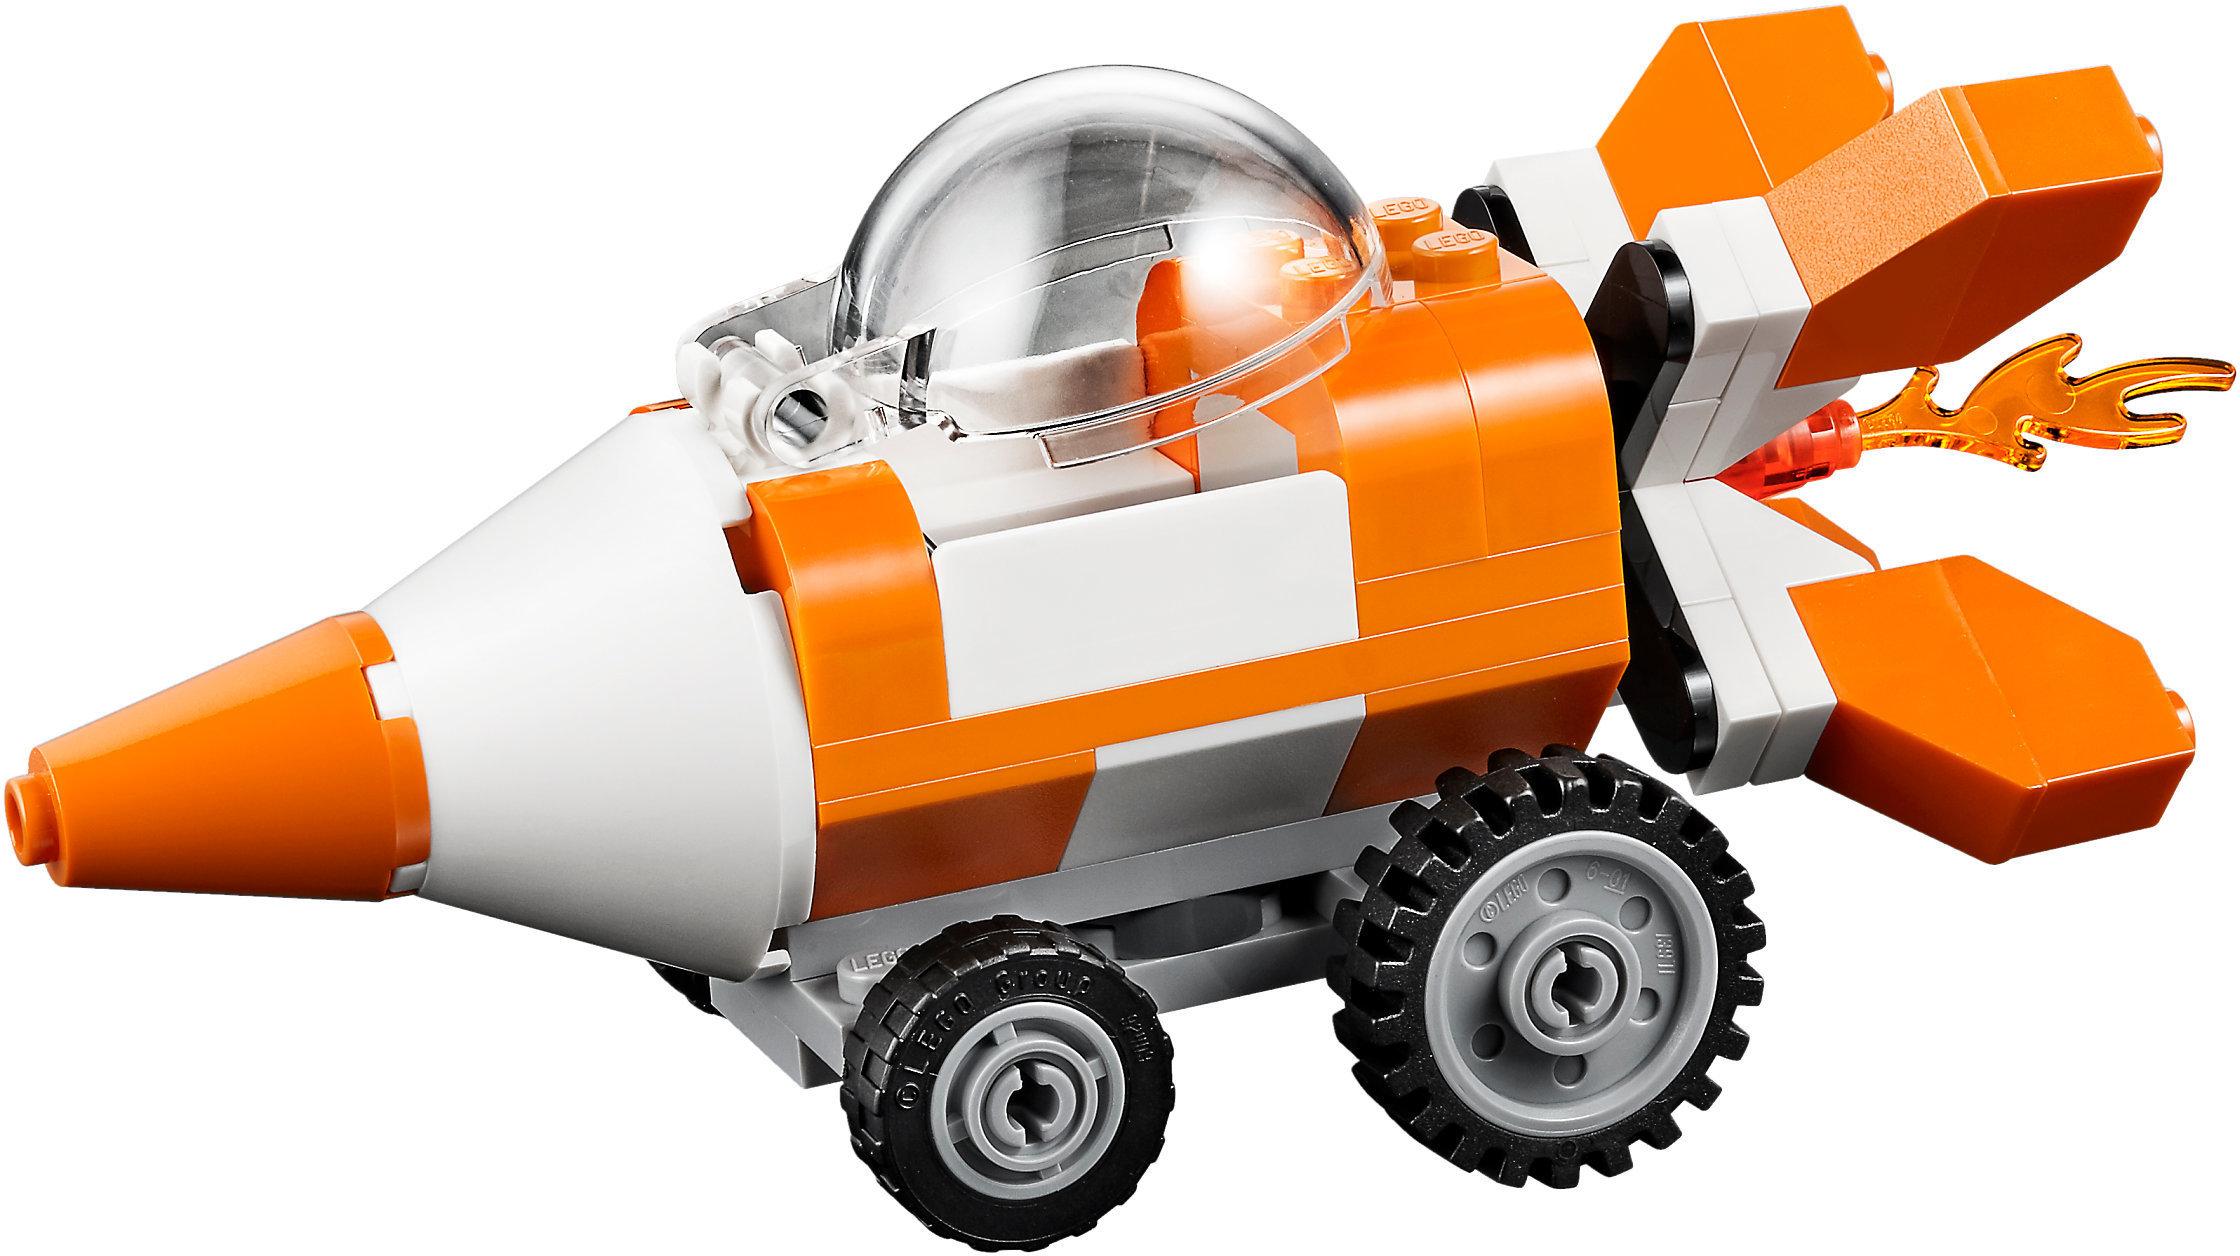 Lego juniors ocean's bottom